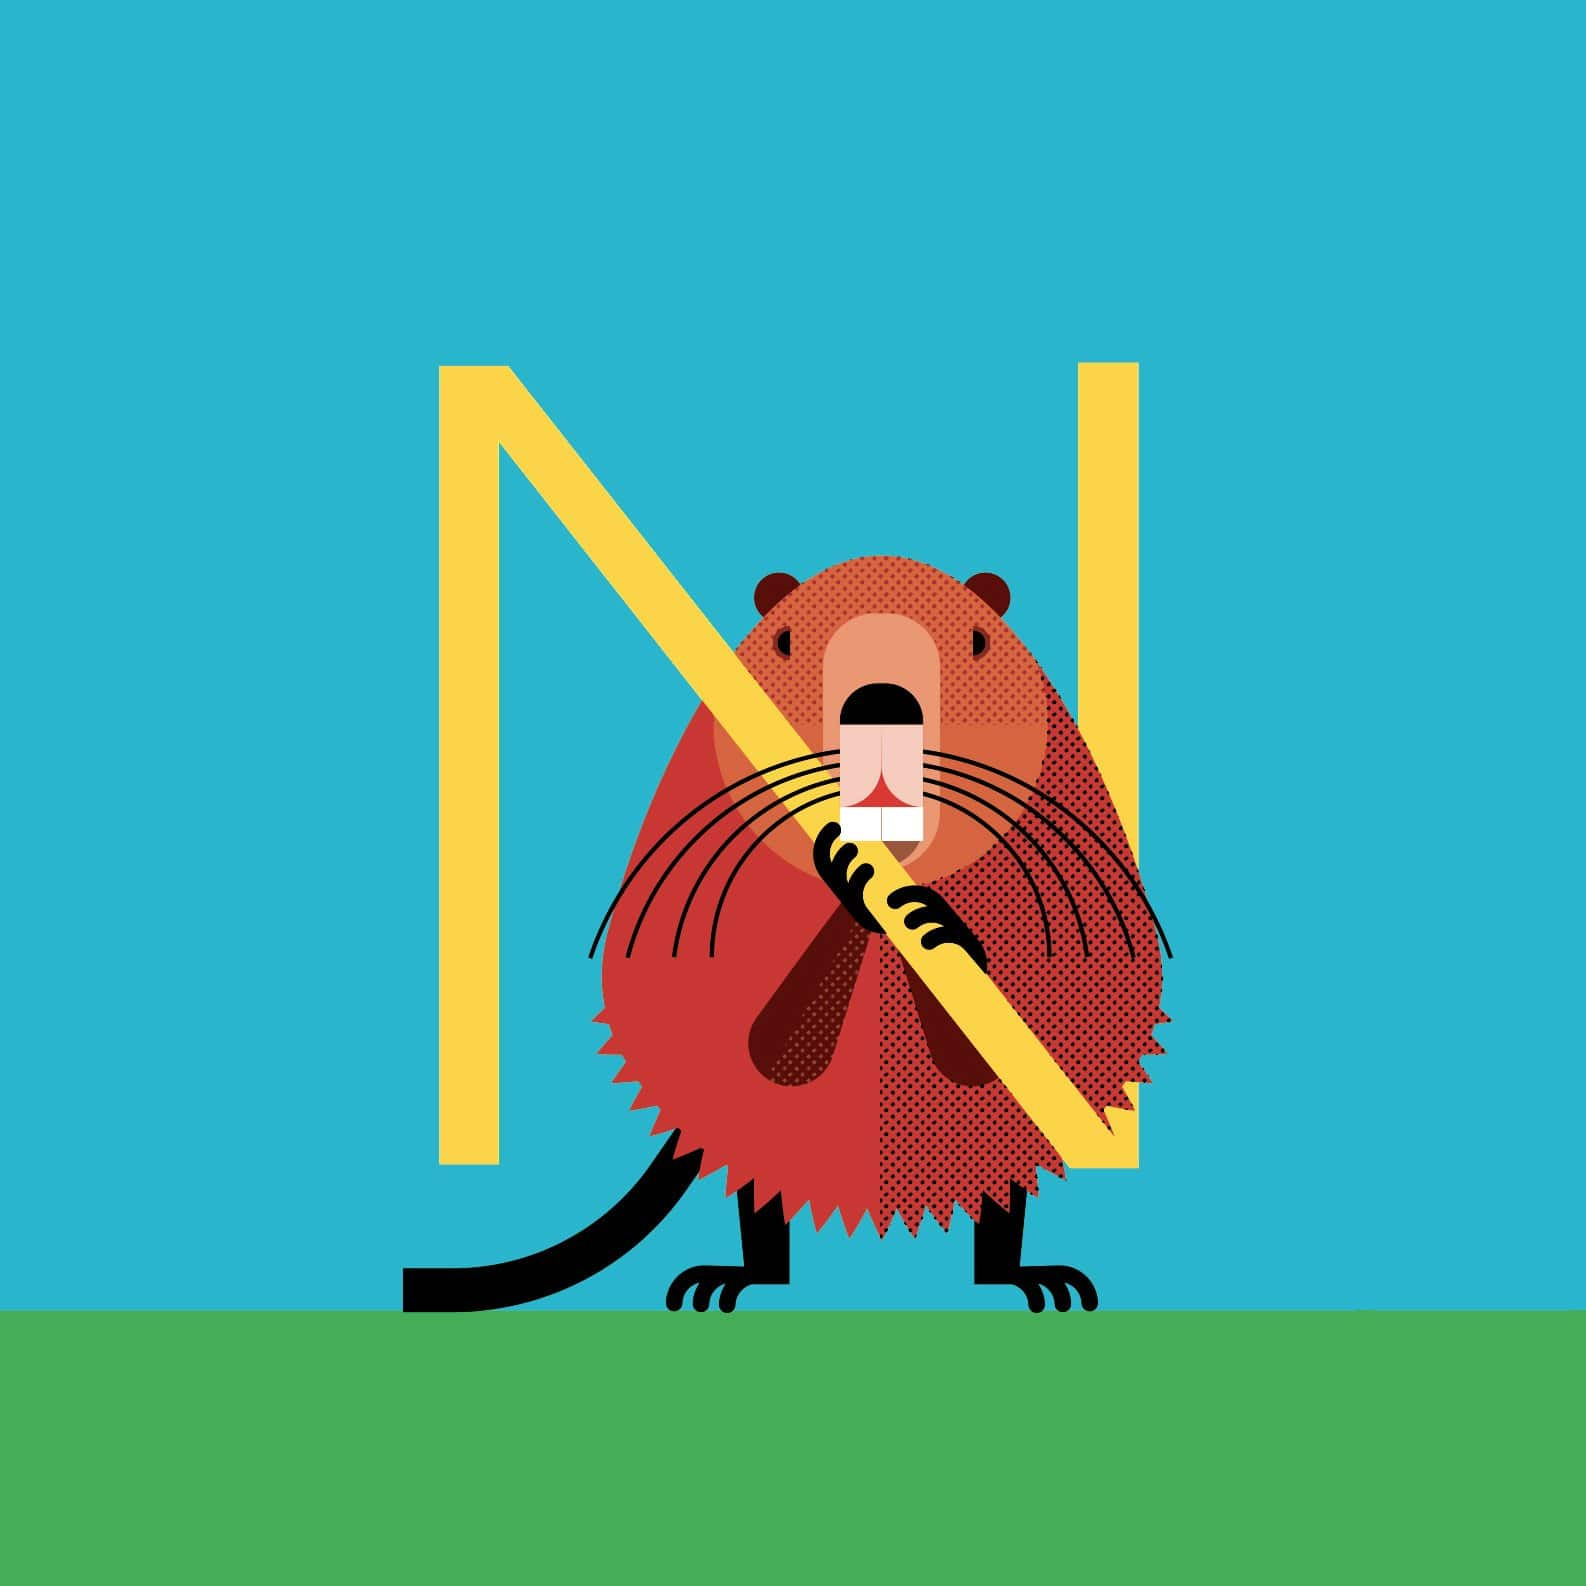 alice-iuri-poster-animal-nutria-illustration